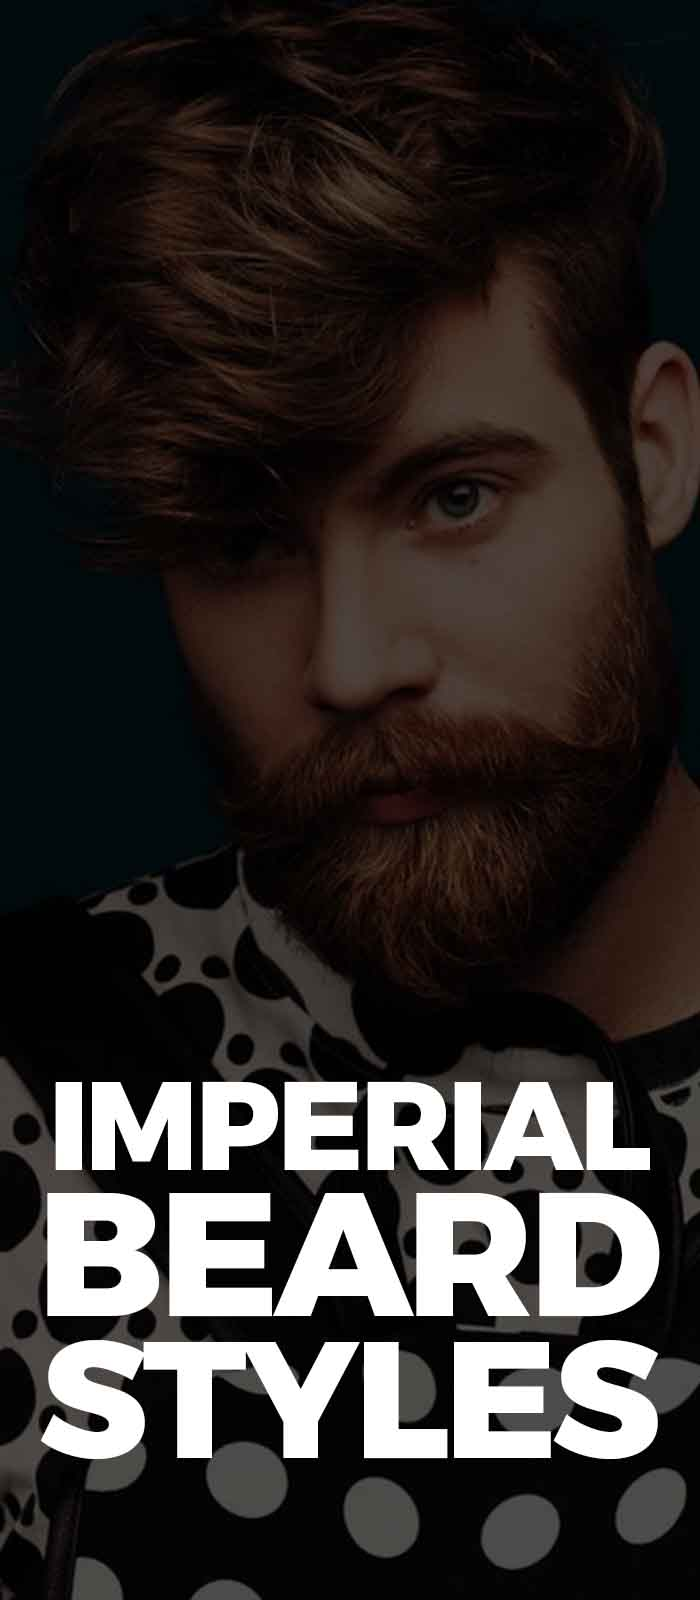 Imperial beard style!